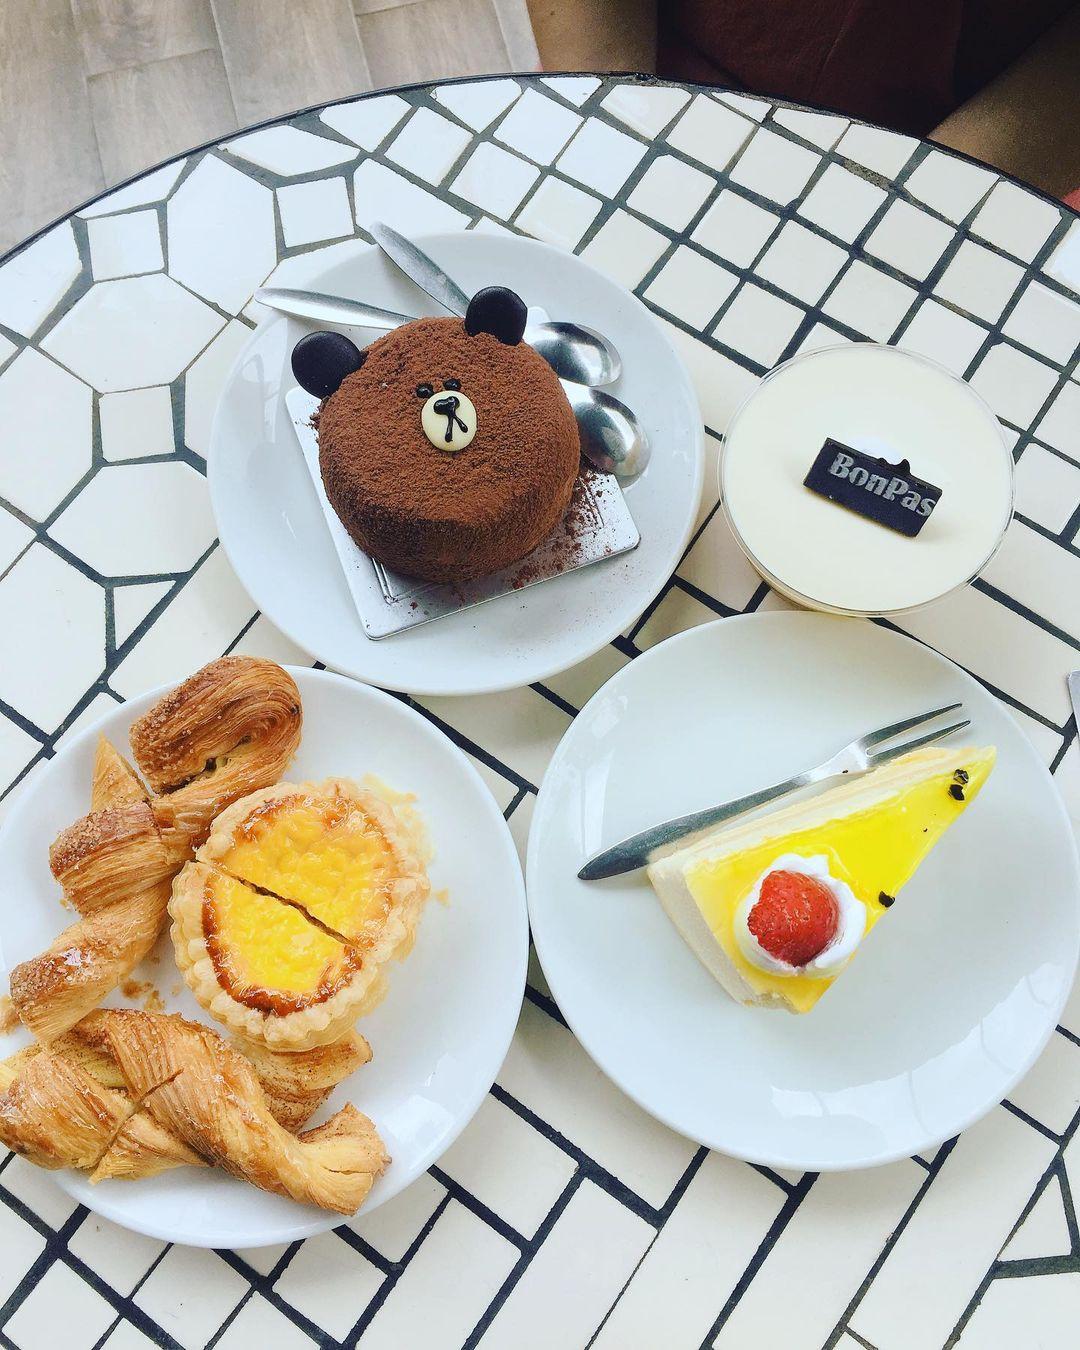 đà nẵng bakeries - bon pas cakes